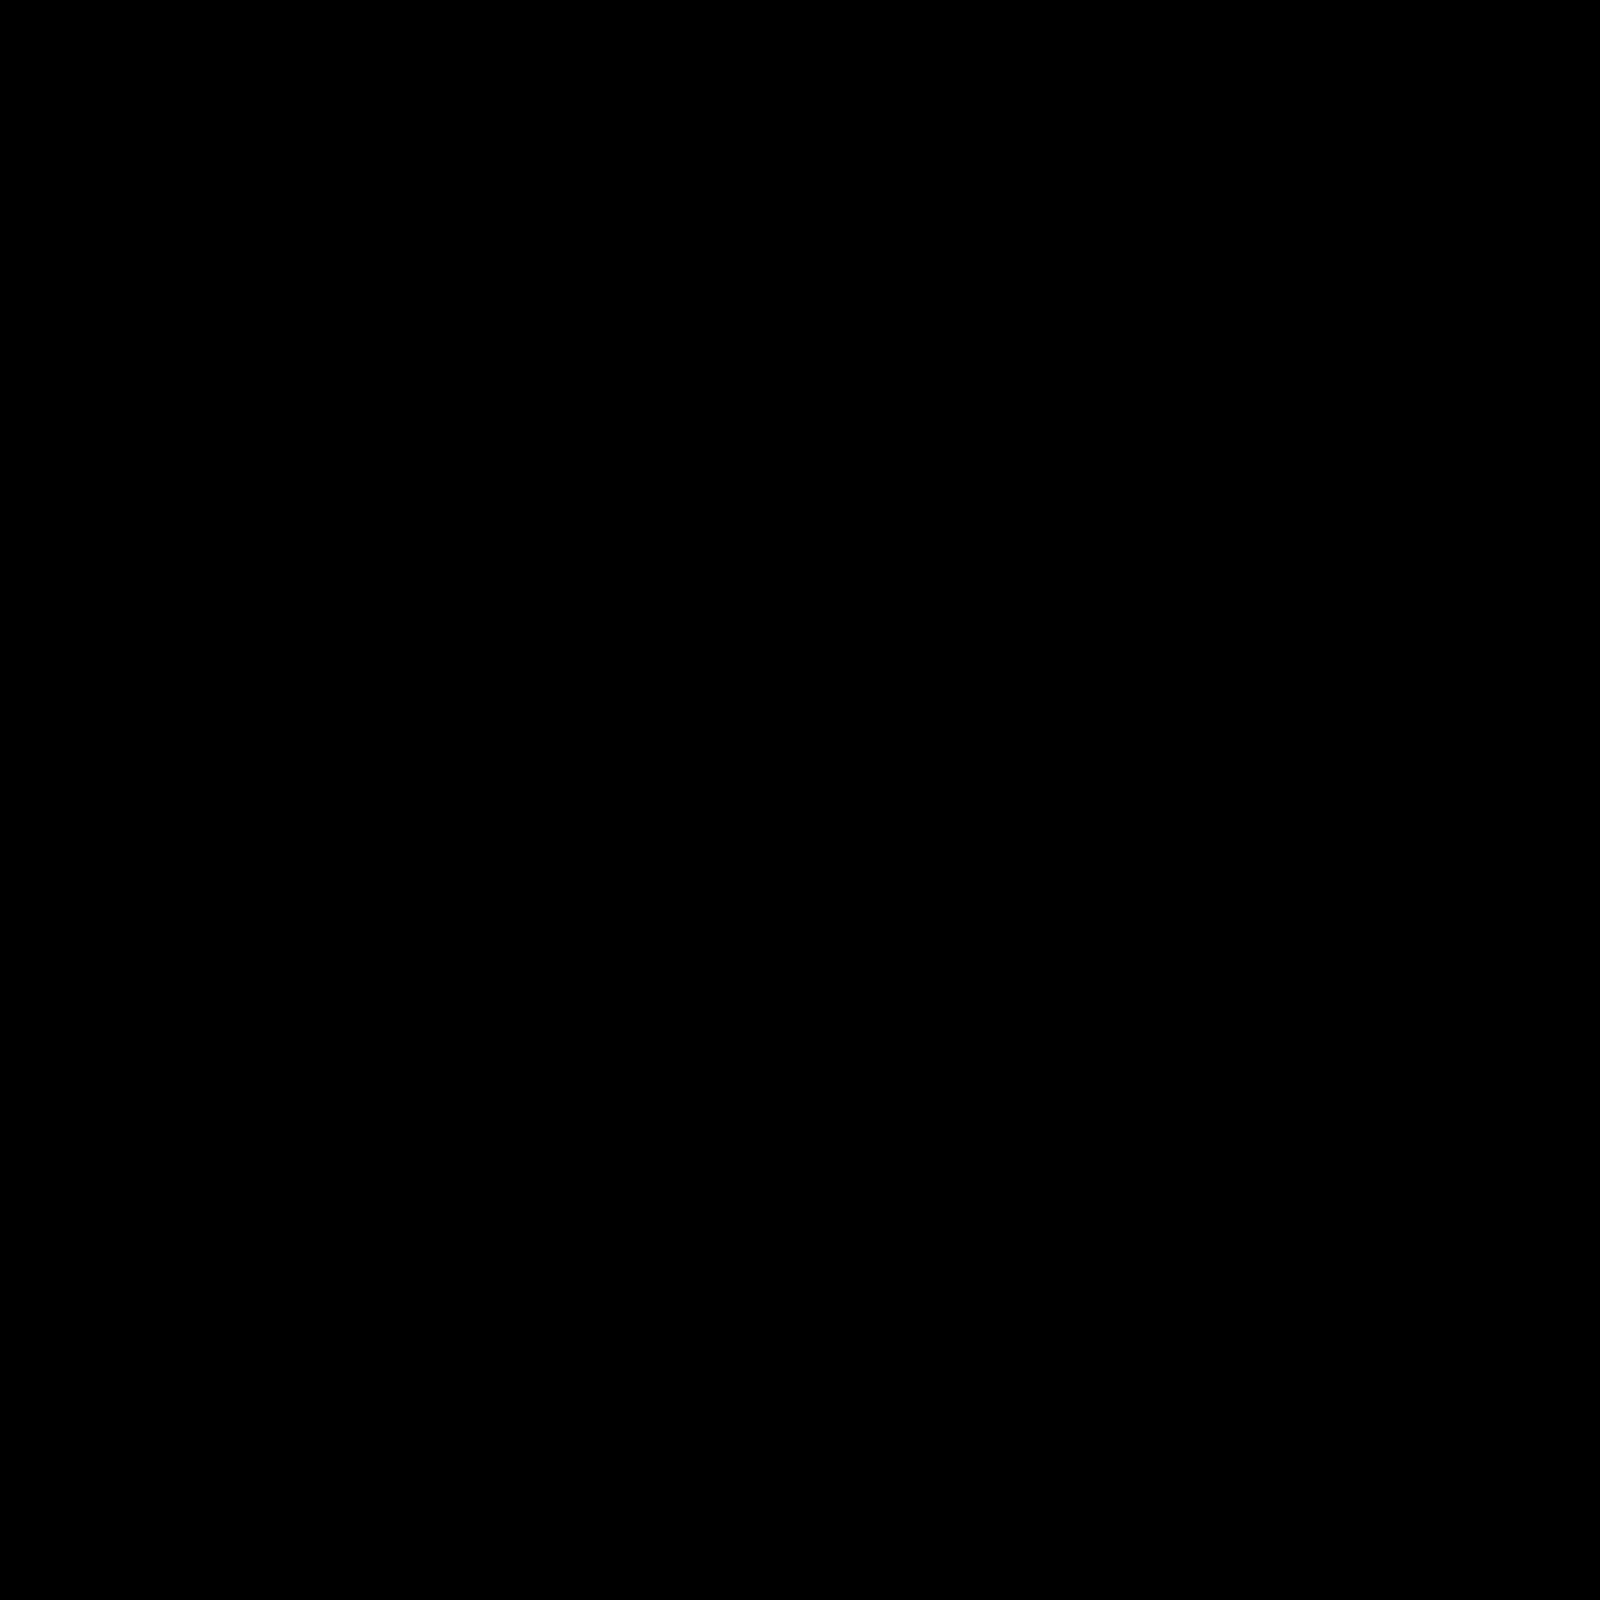 Latch icon